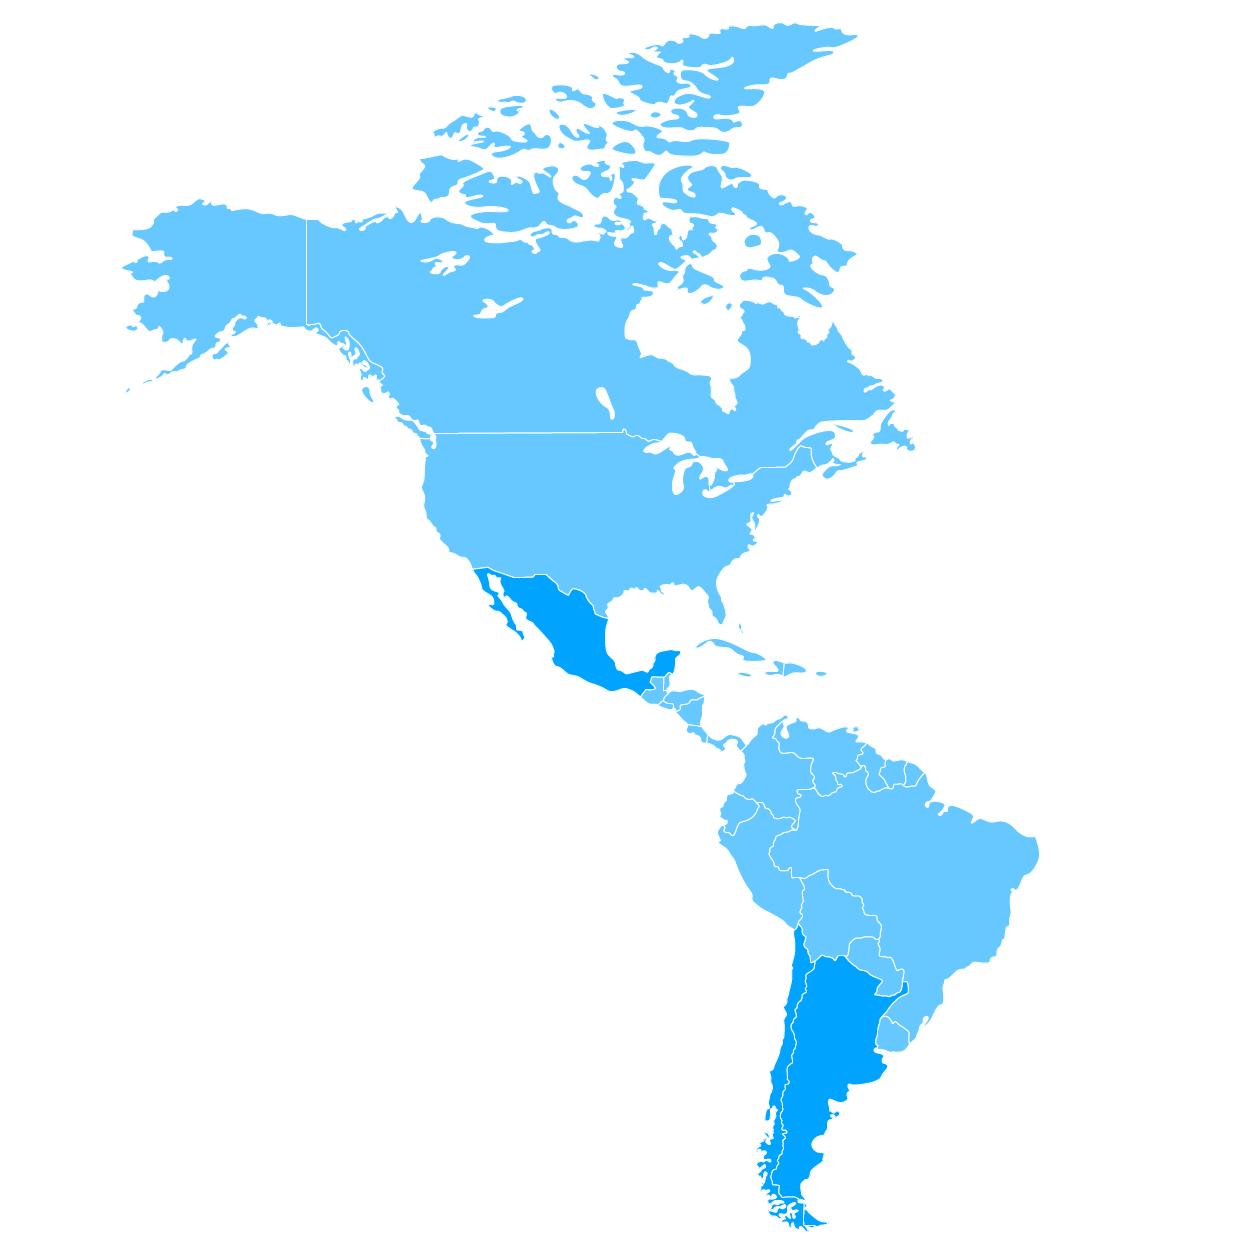 Balloon ha trabajado con más de 70 comunidades de 3 países distintos de Latinoamérica. -